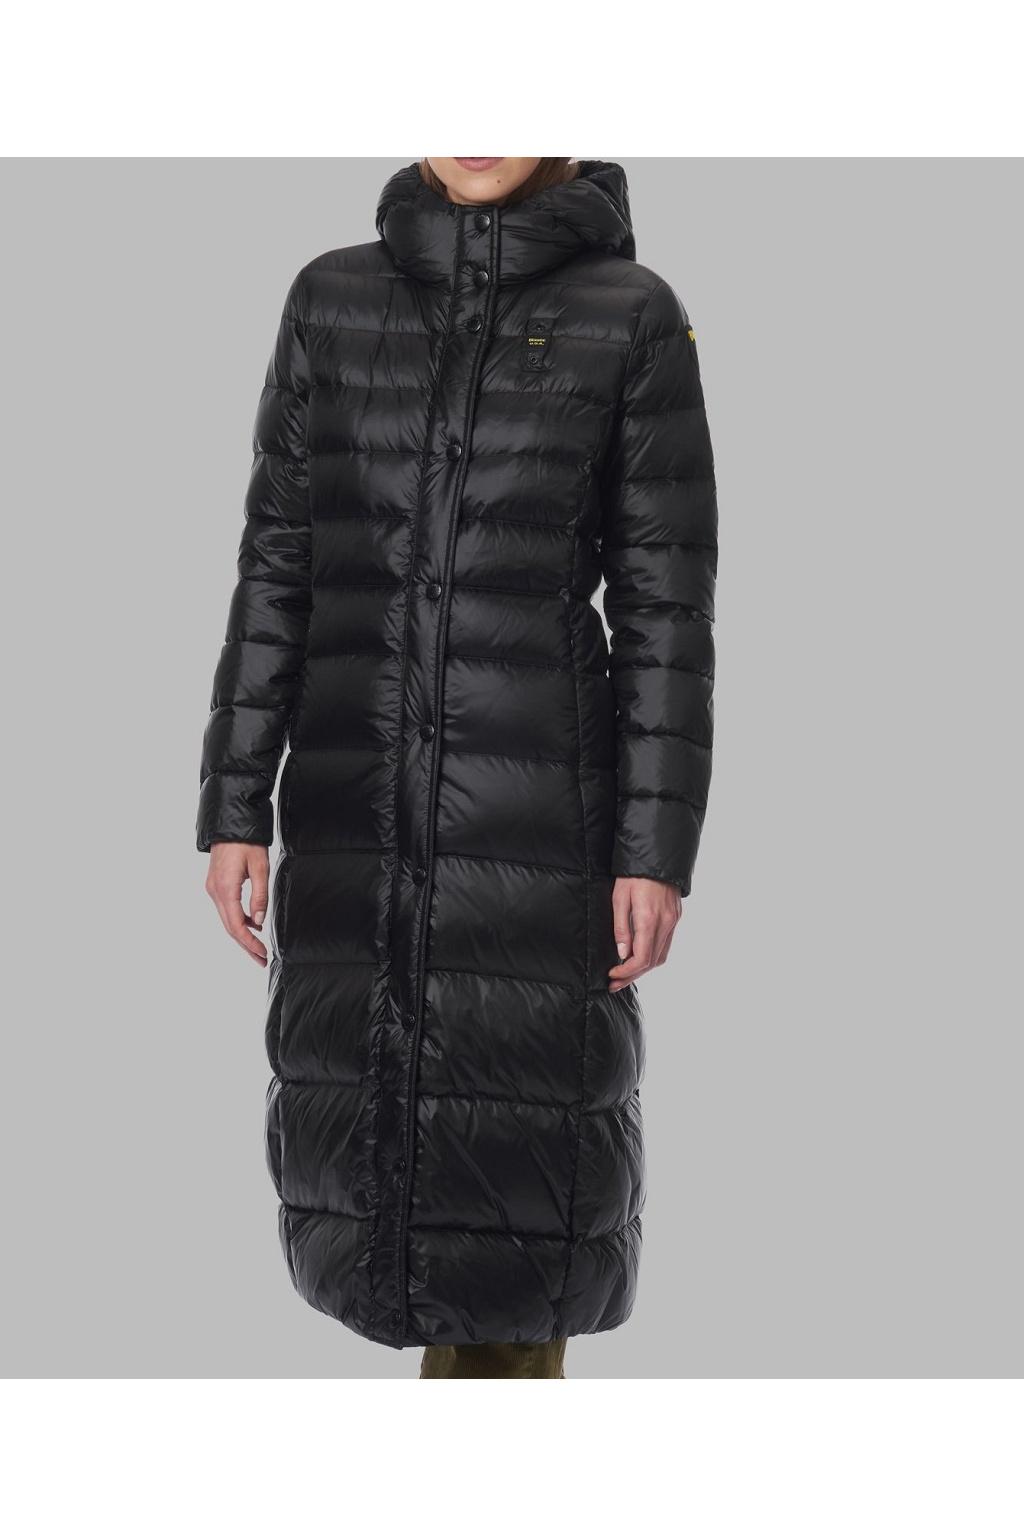 Dámská bunda Blauer 21WBLDK03075 černá